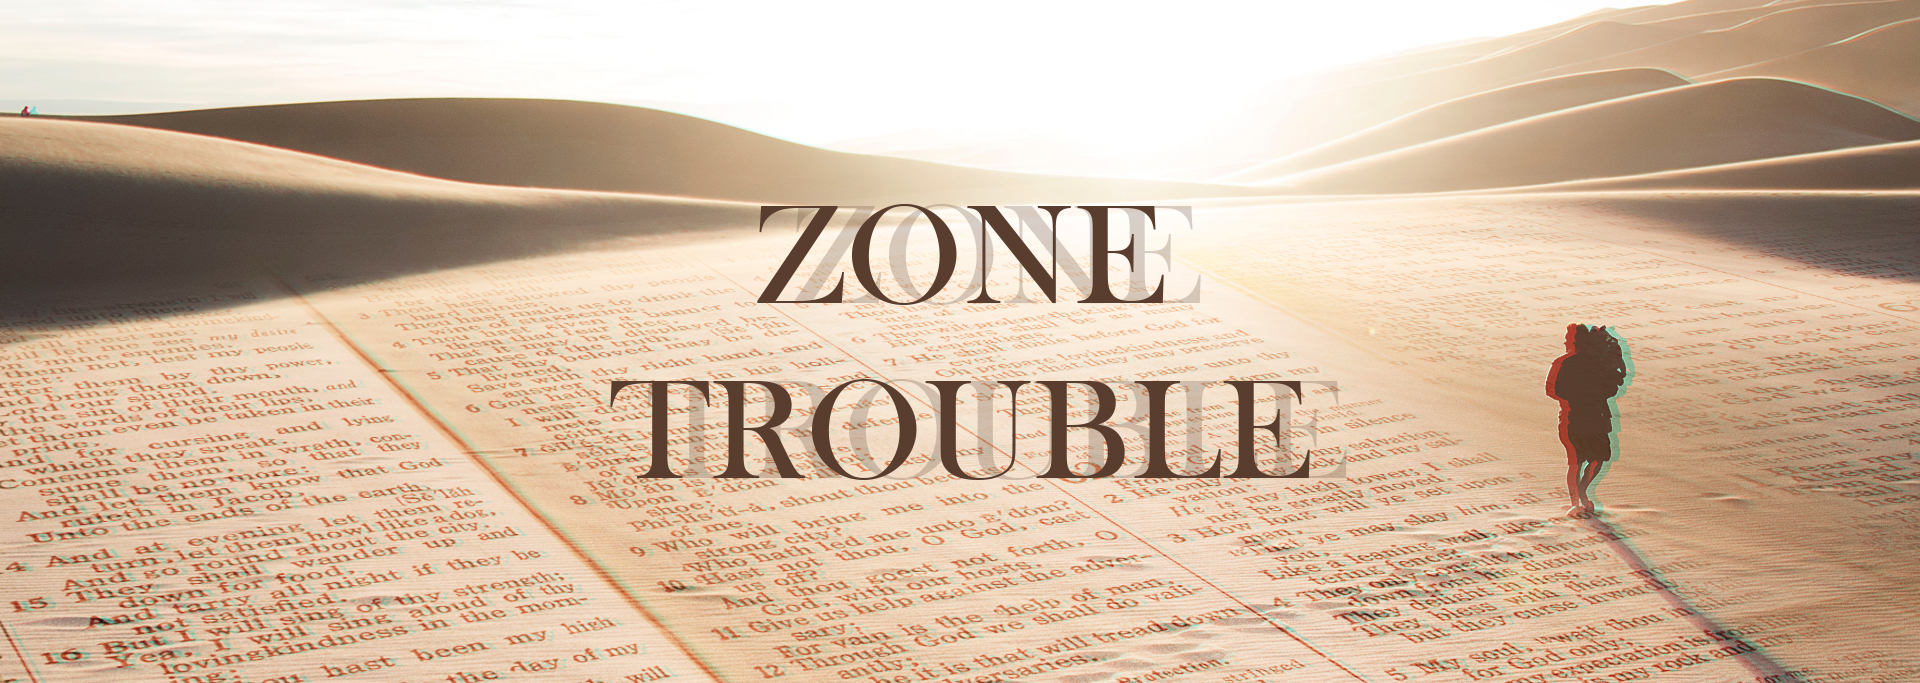 Zone trouble